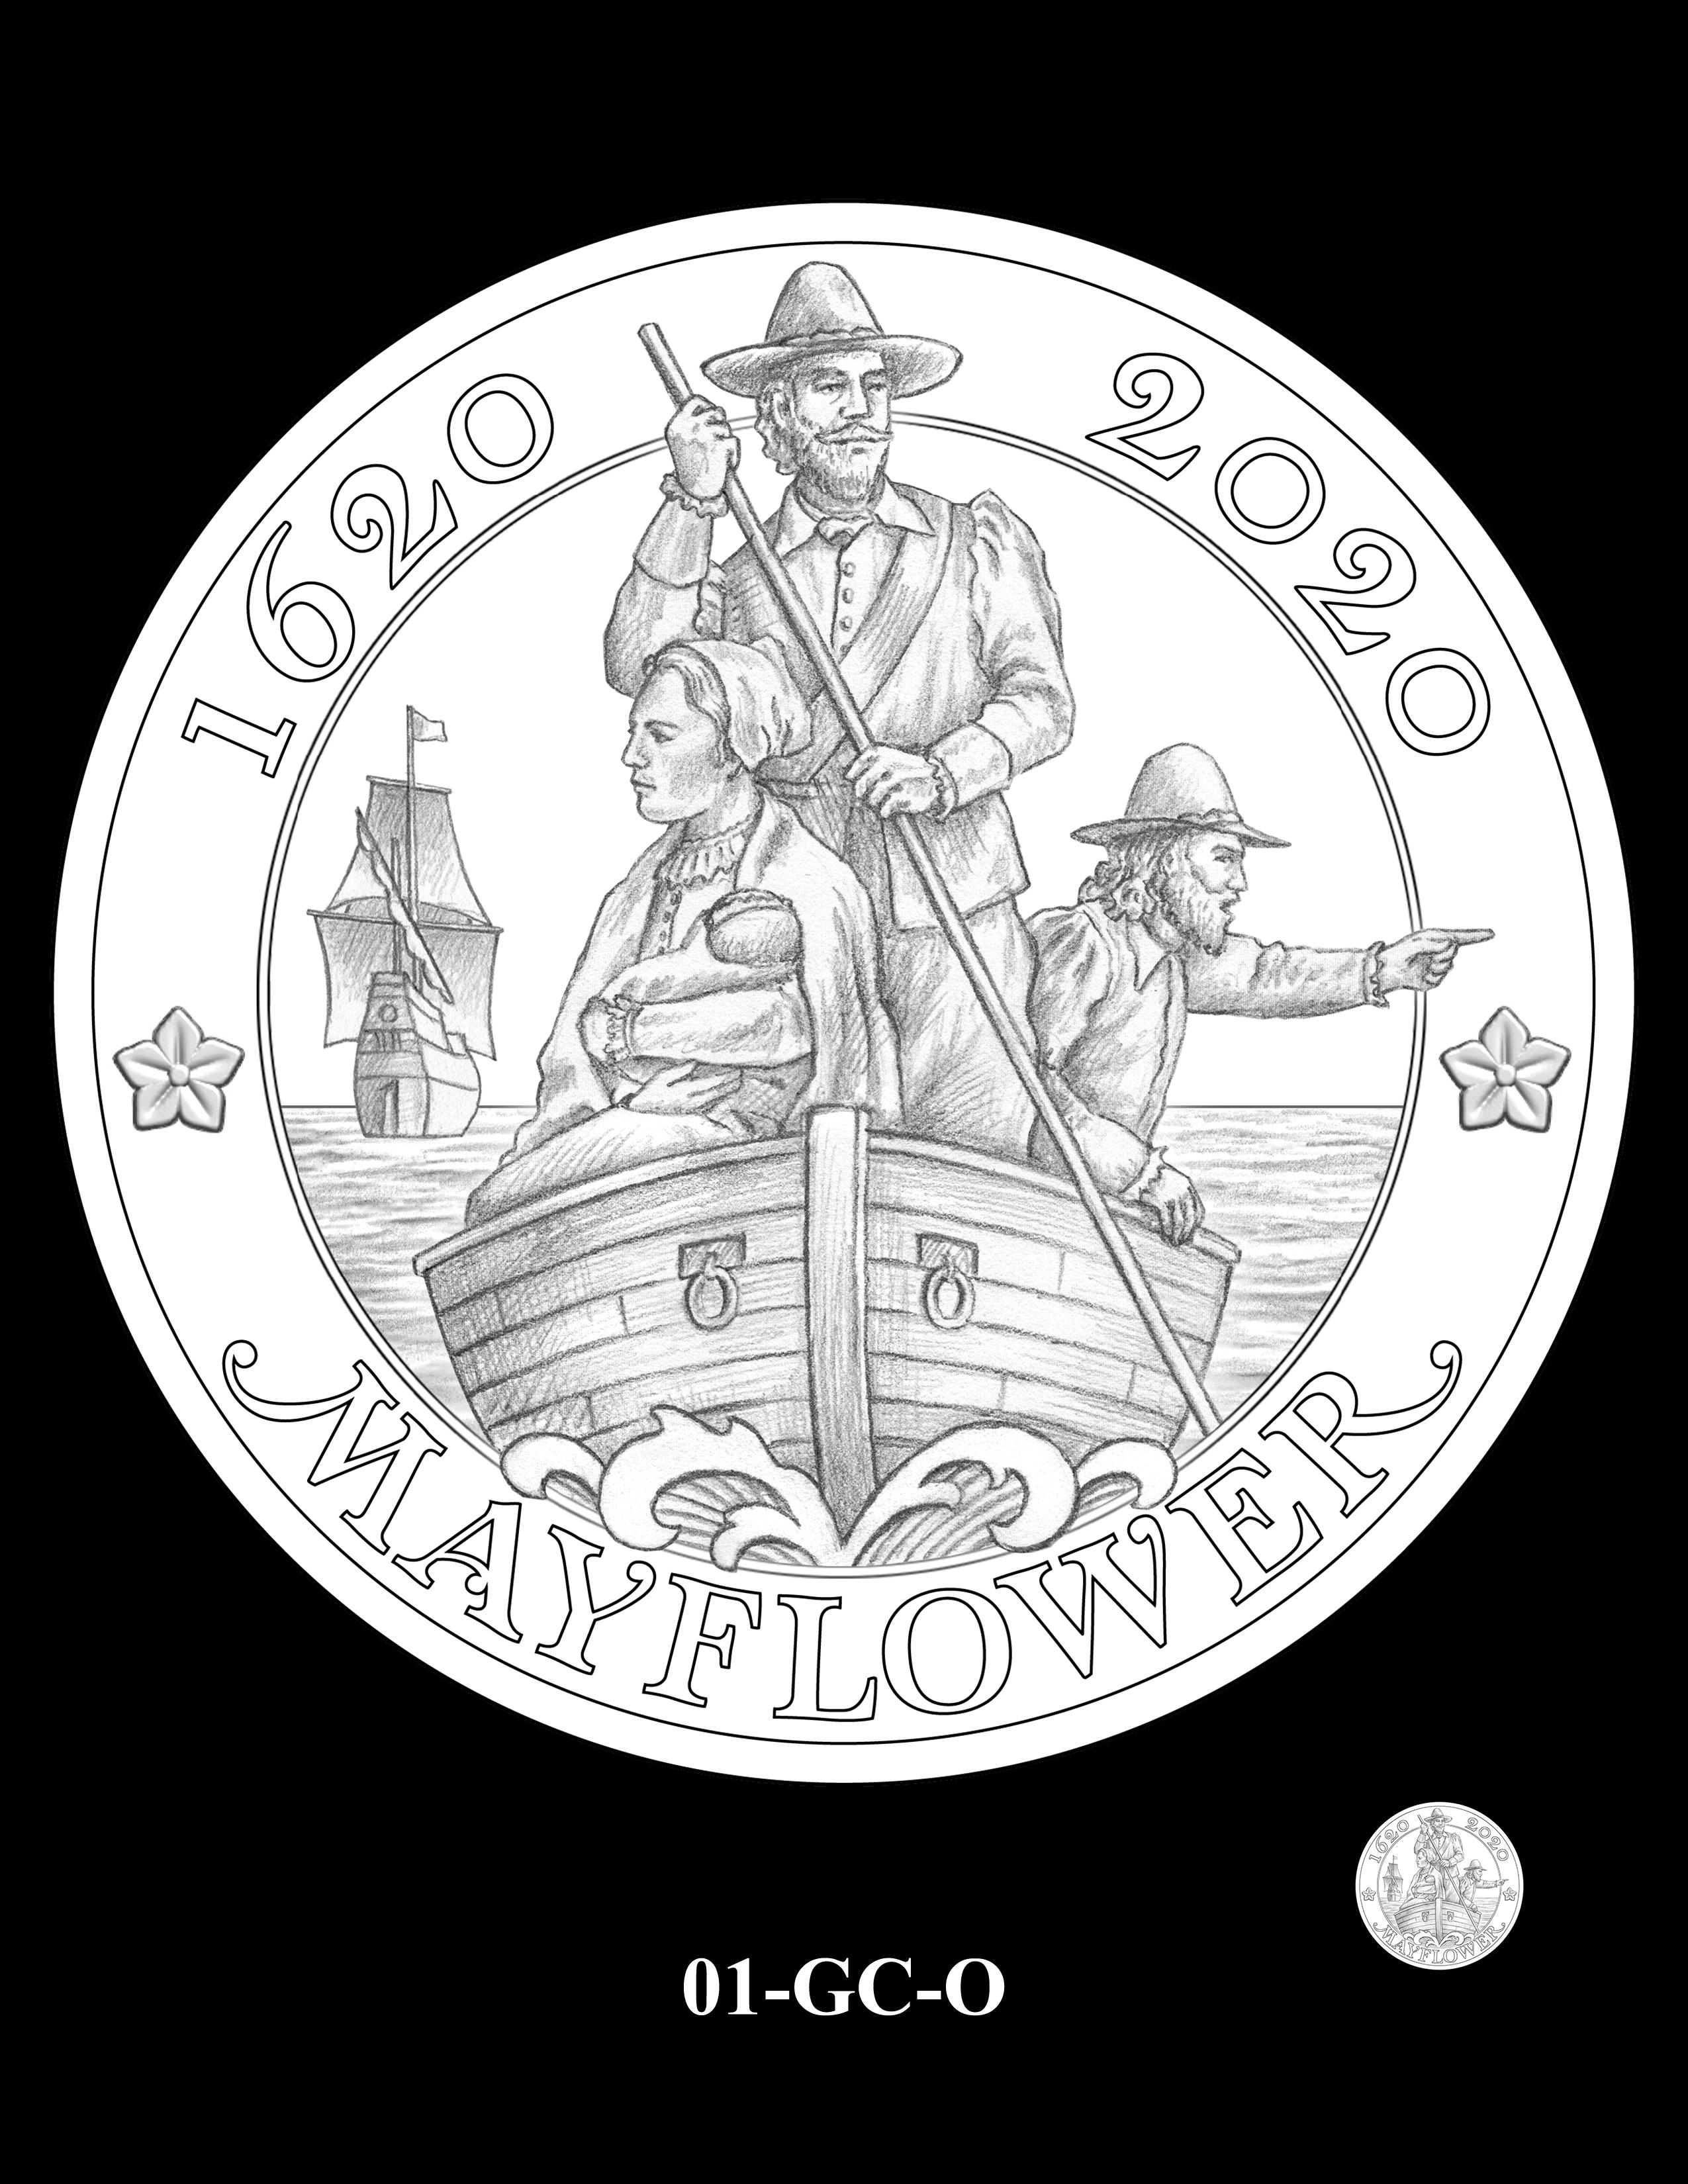 01-GC-O - 2020 Mayflower 400th Anniversary 24K Gold Coin & Silver Medal Program